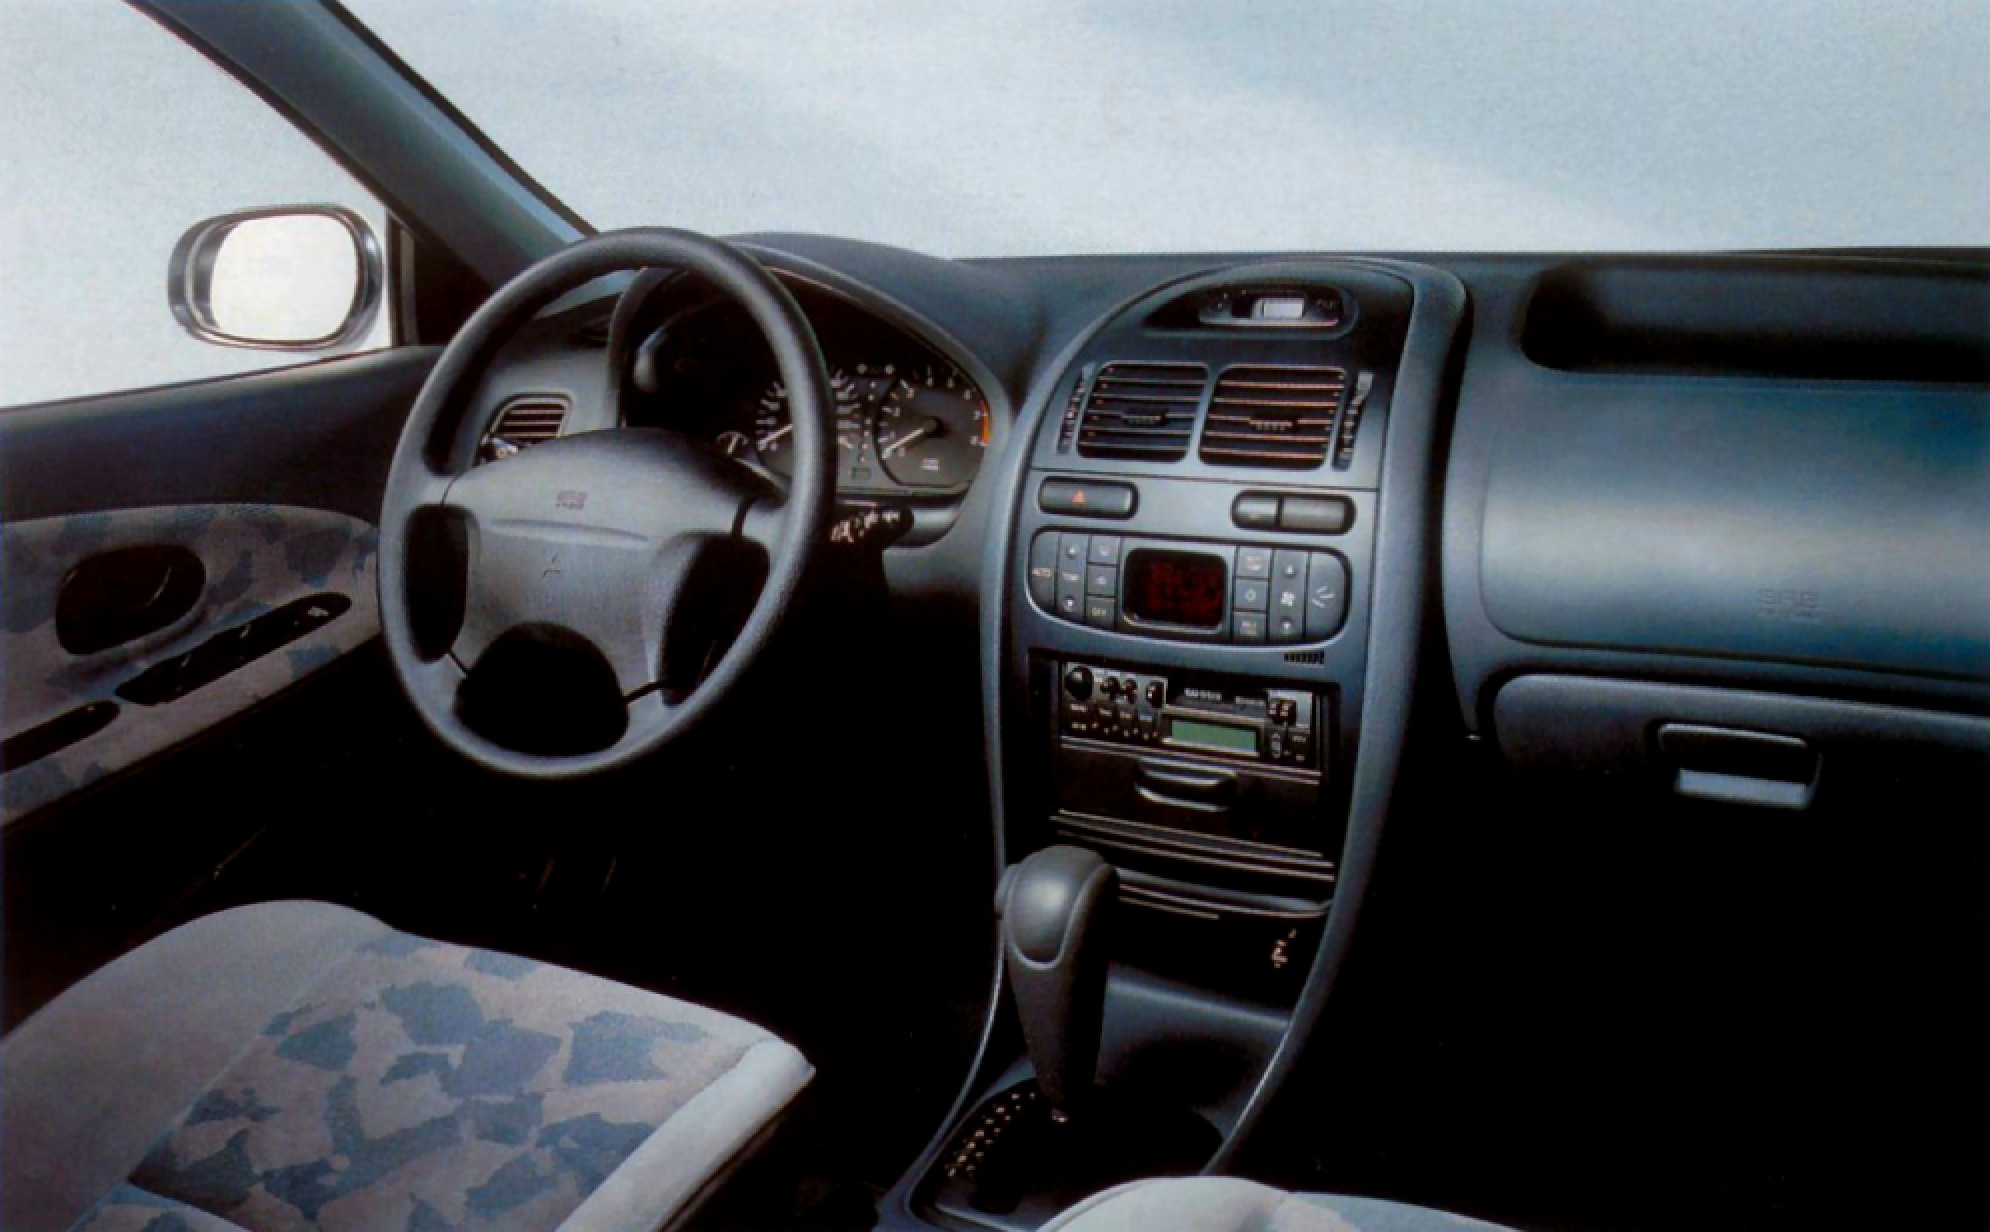 MITSUBISHI Carisma Sedan - 1995, 1996, 1997, 1998, 1999, 2000